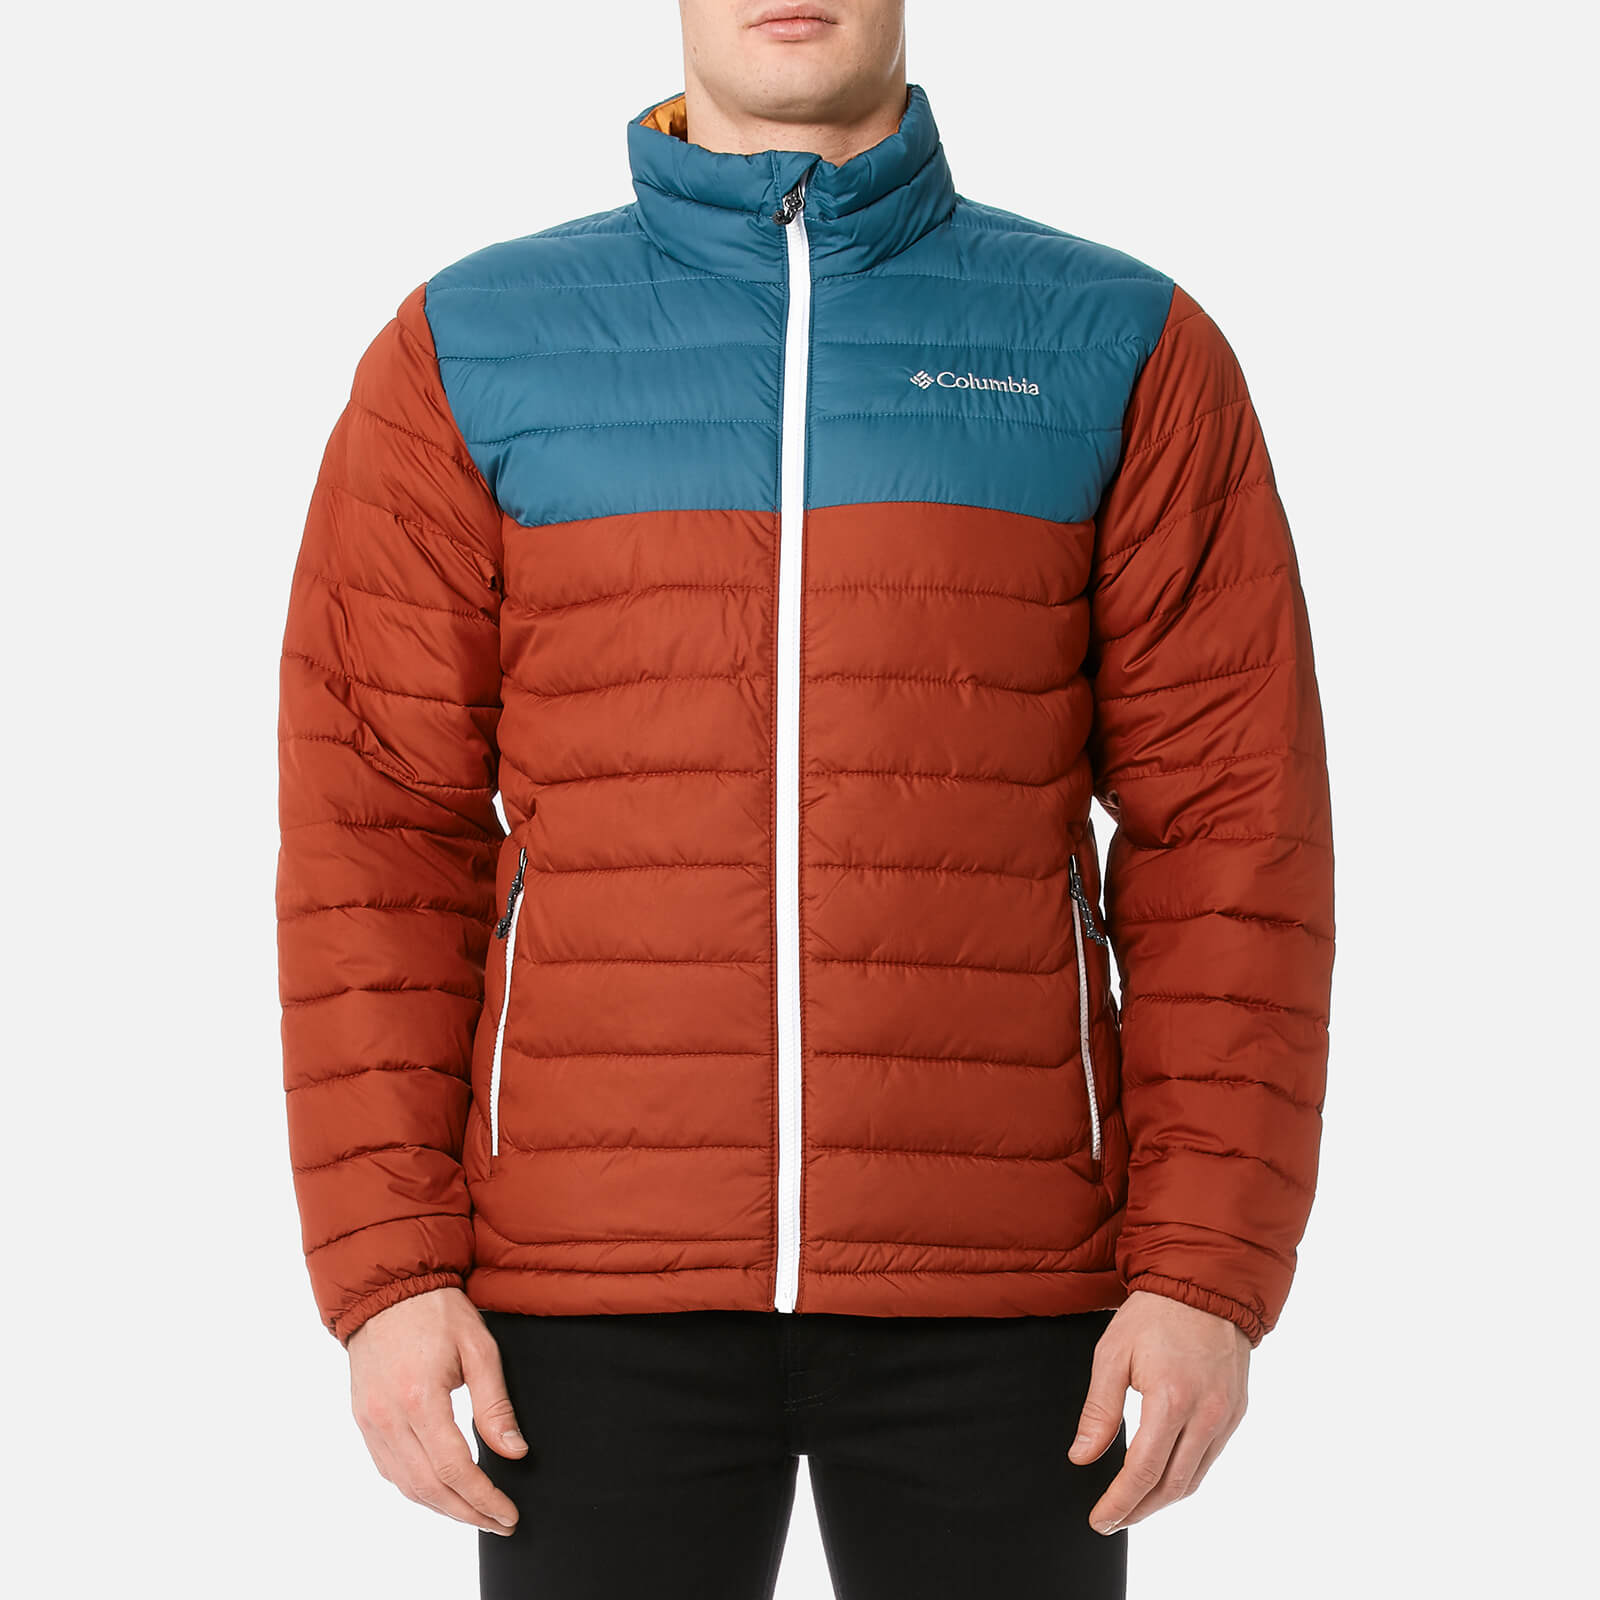 34c4f9100 Columbia Men's Powder Lite Jacket - Rusty/Blue Heron/Canyan Gold